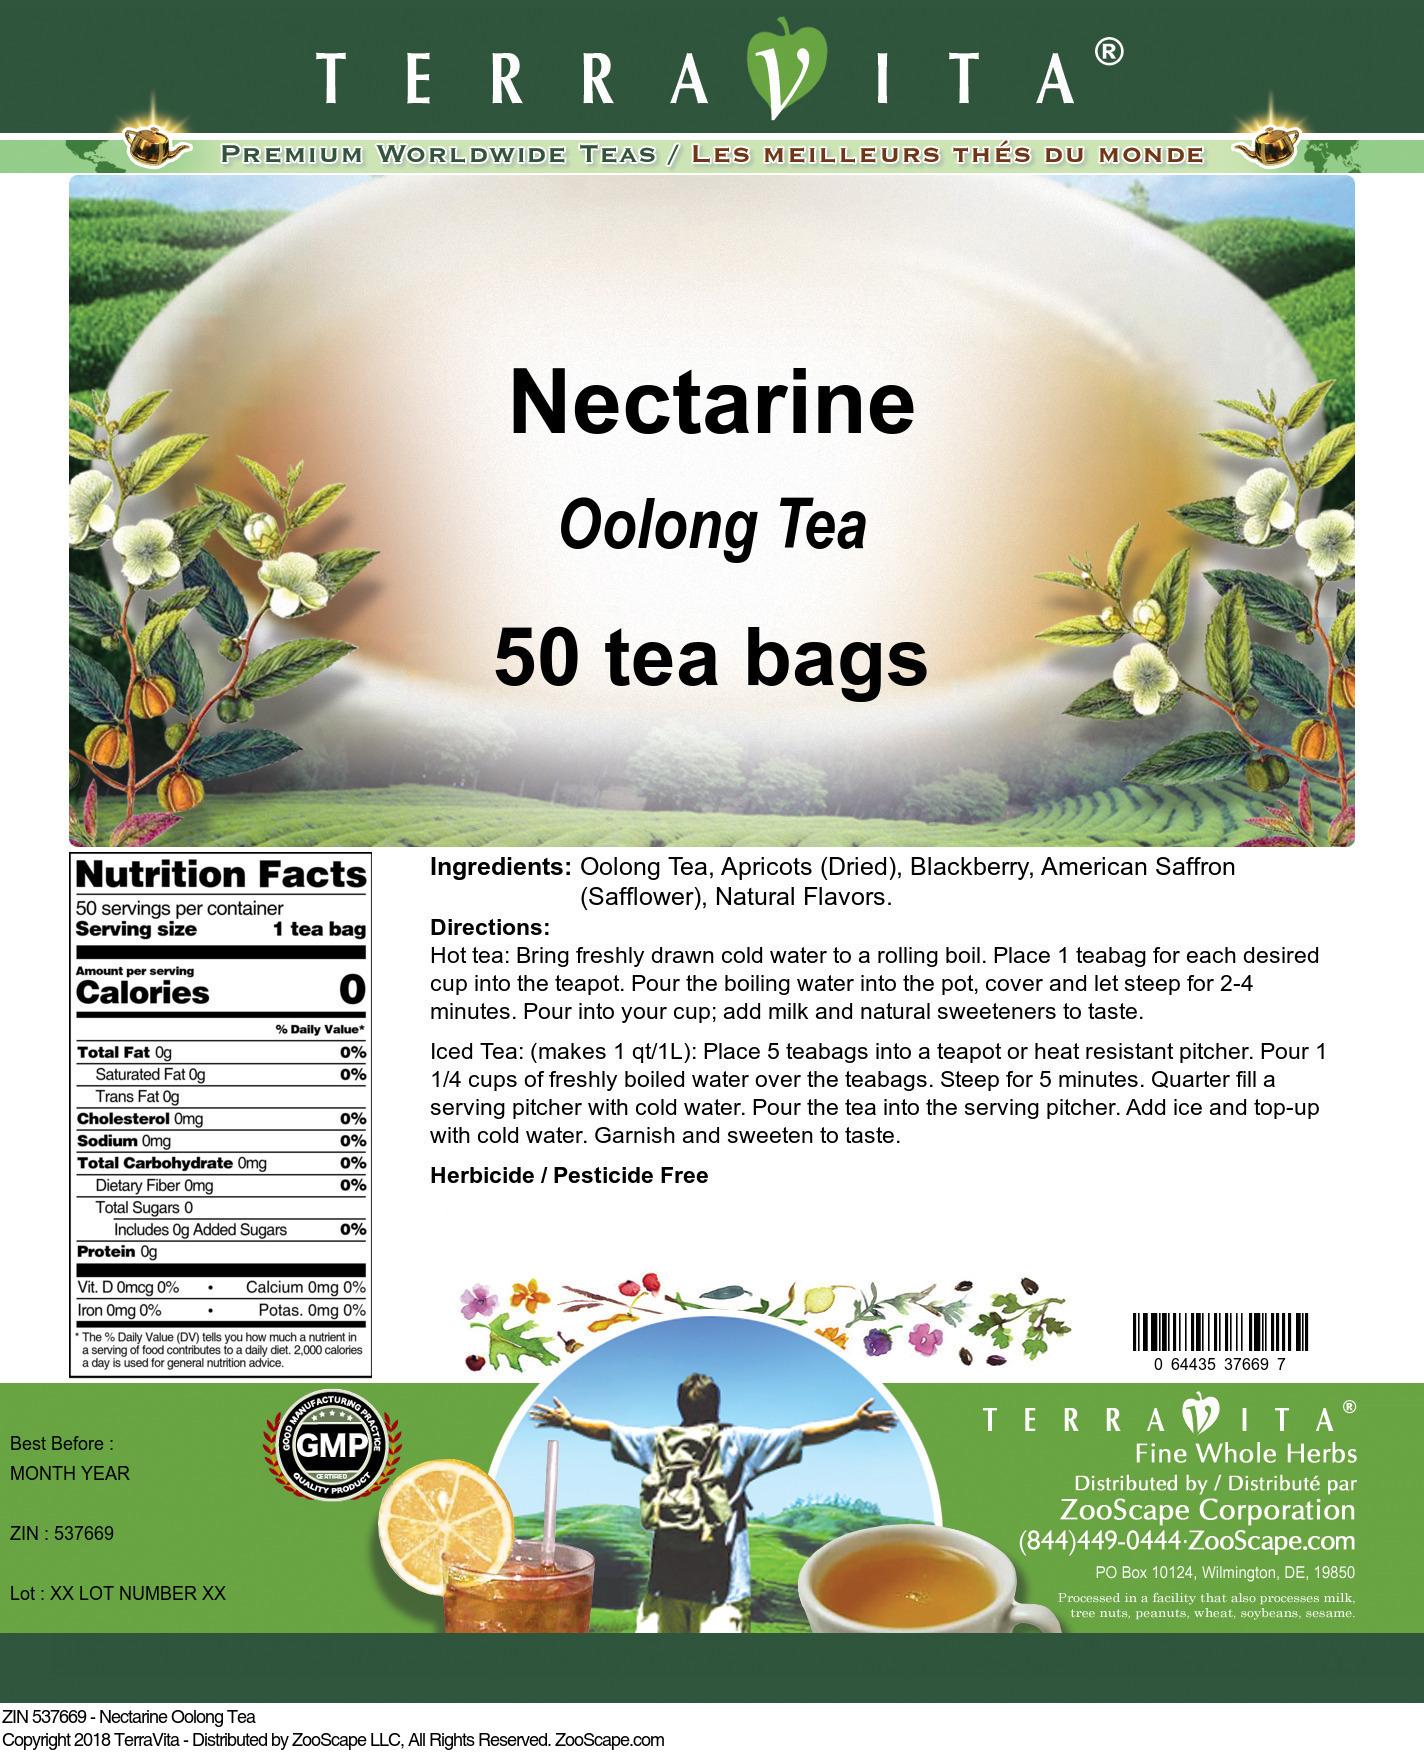 Nectarine Oolong Tea